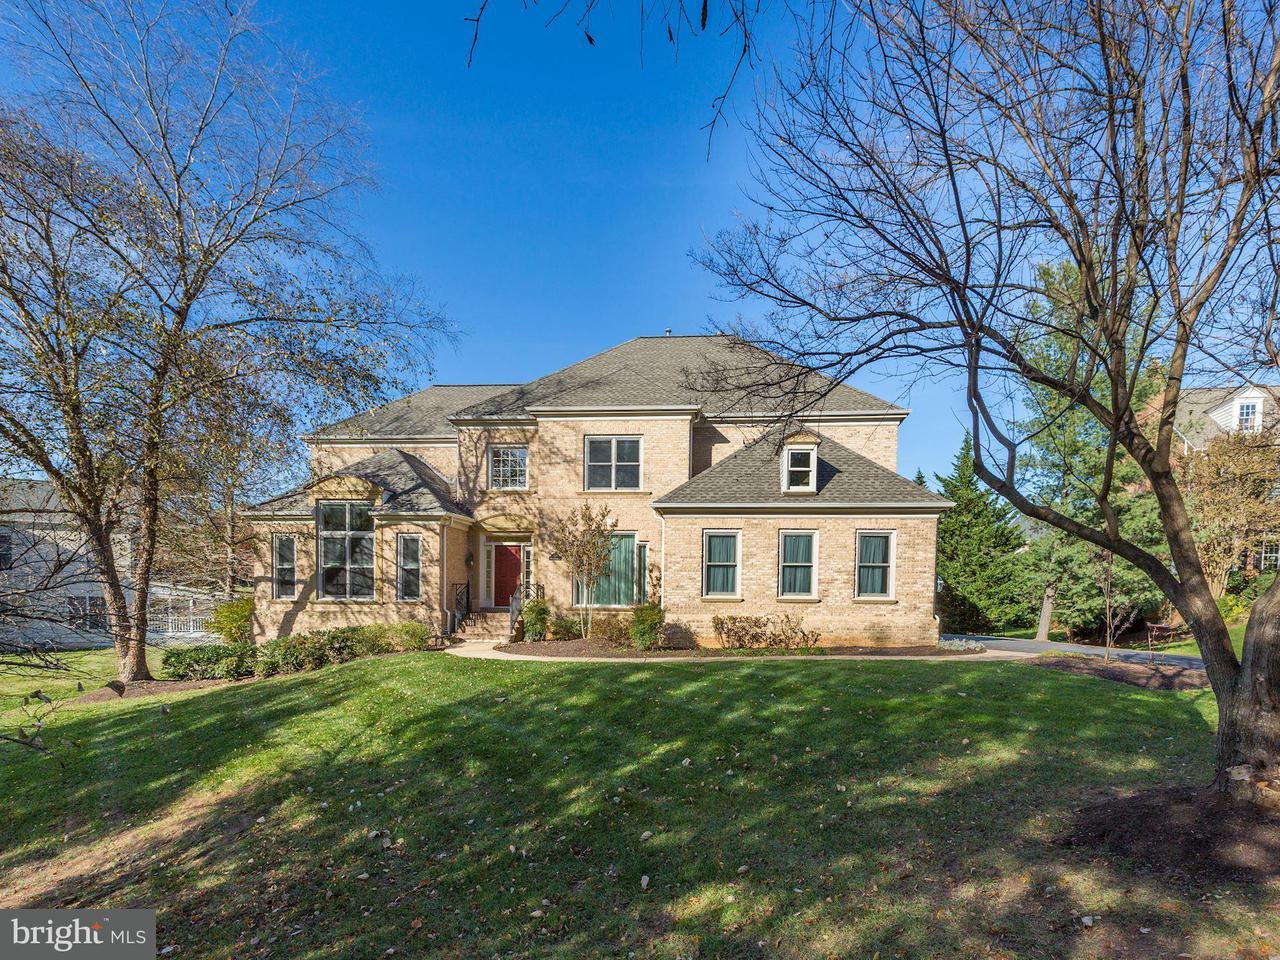 Single Family Home for Sale at 1411 WOODHURST BLVD 1411 WOODHURST BLVD McLean, Virginia 22102 United States